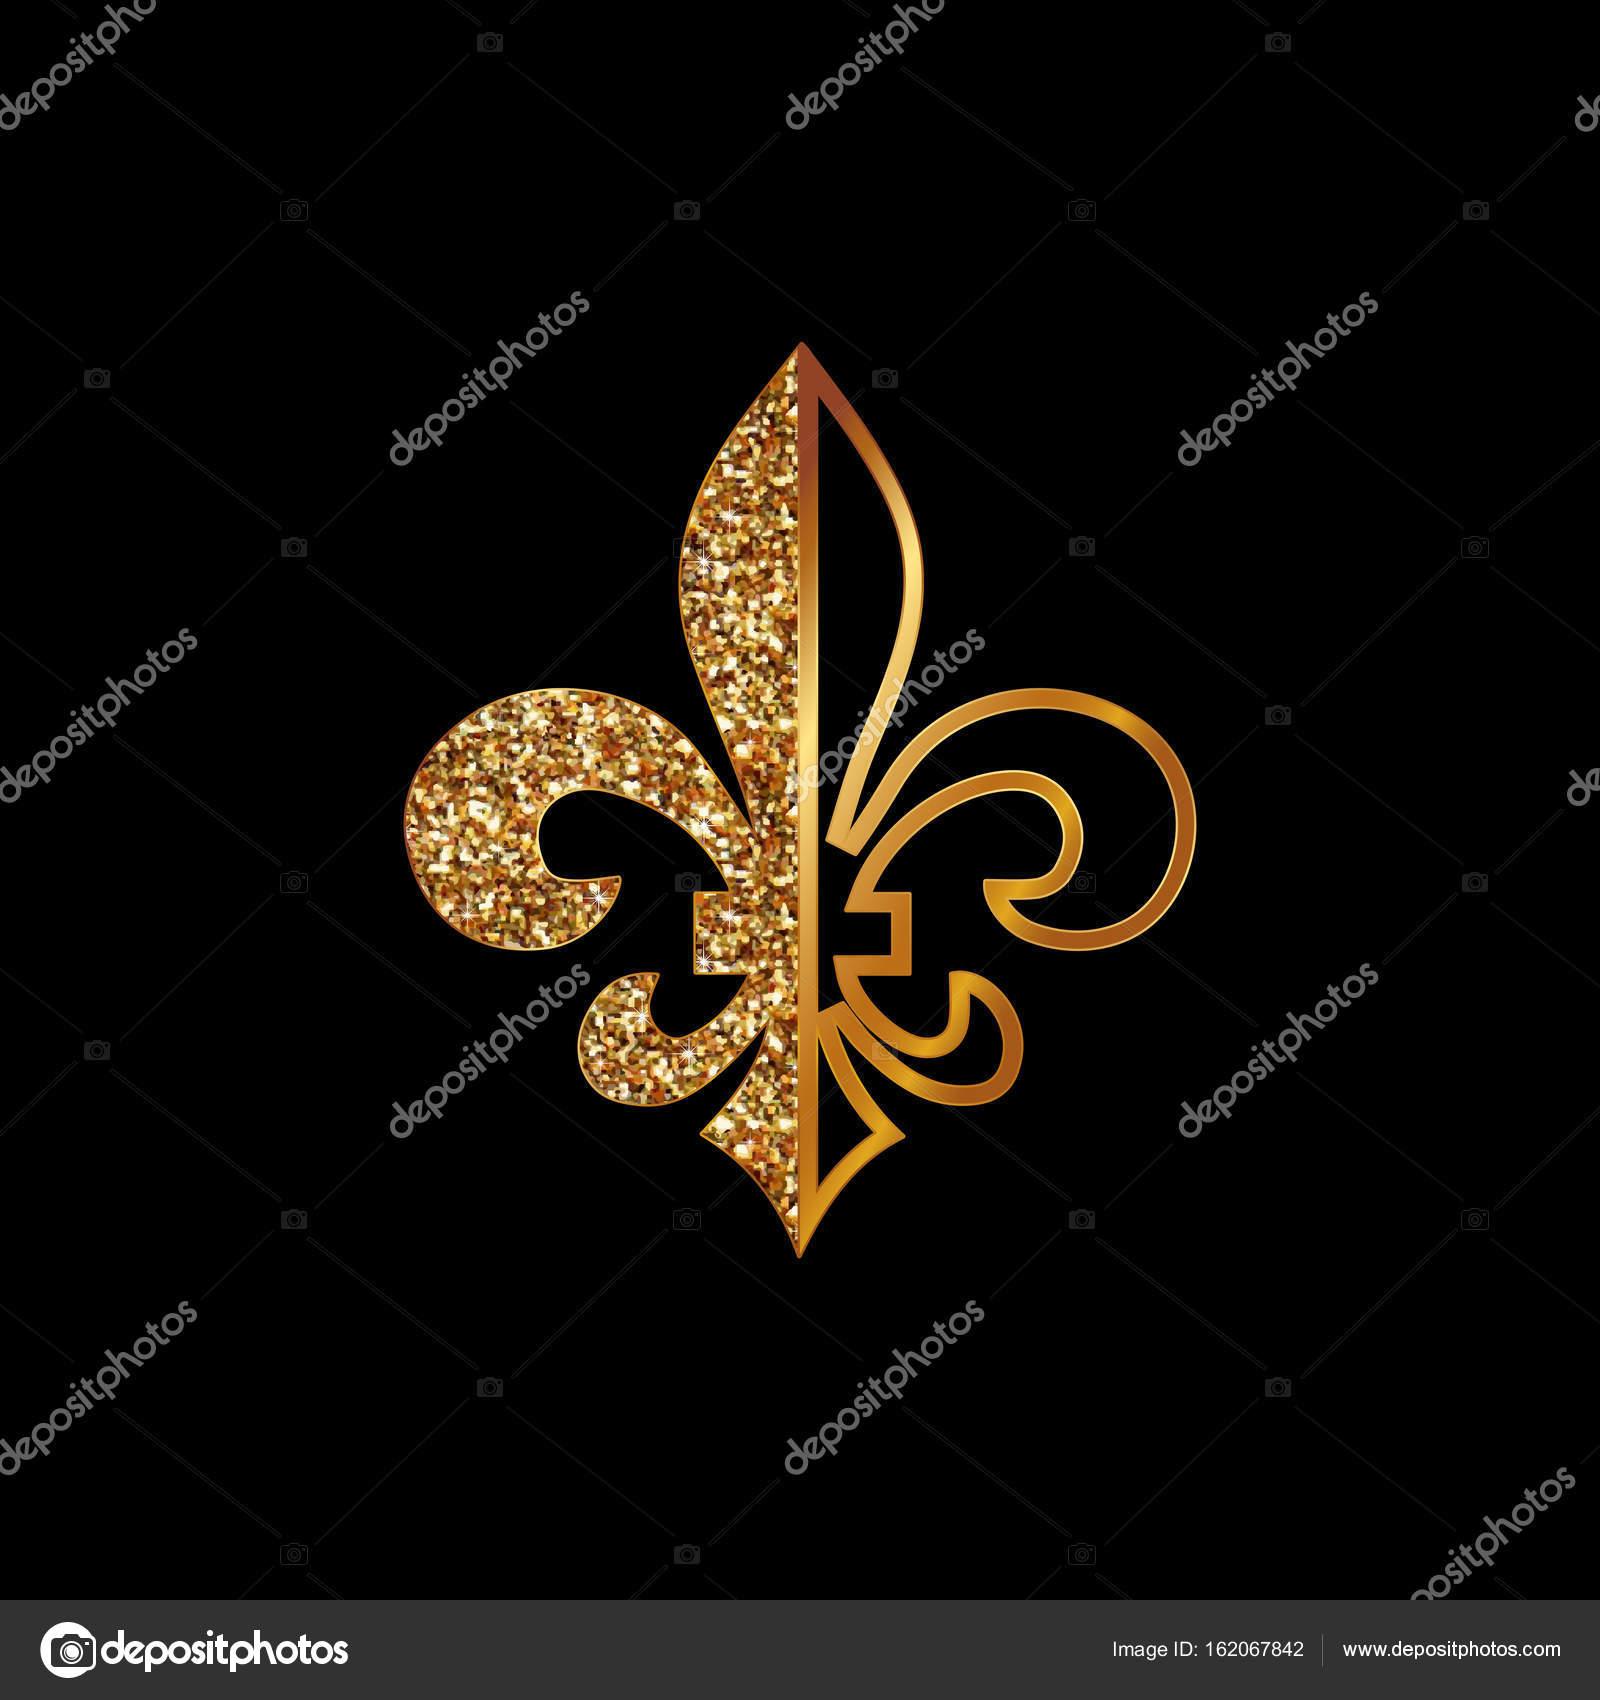 Fleur de lis symbols golden glittering silhouettes heraldic fleur de lis symbols golden glittering silhouettes heraldic symbols vector illustrationdieval biocorpaavc